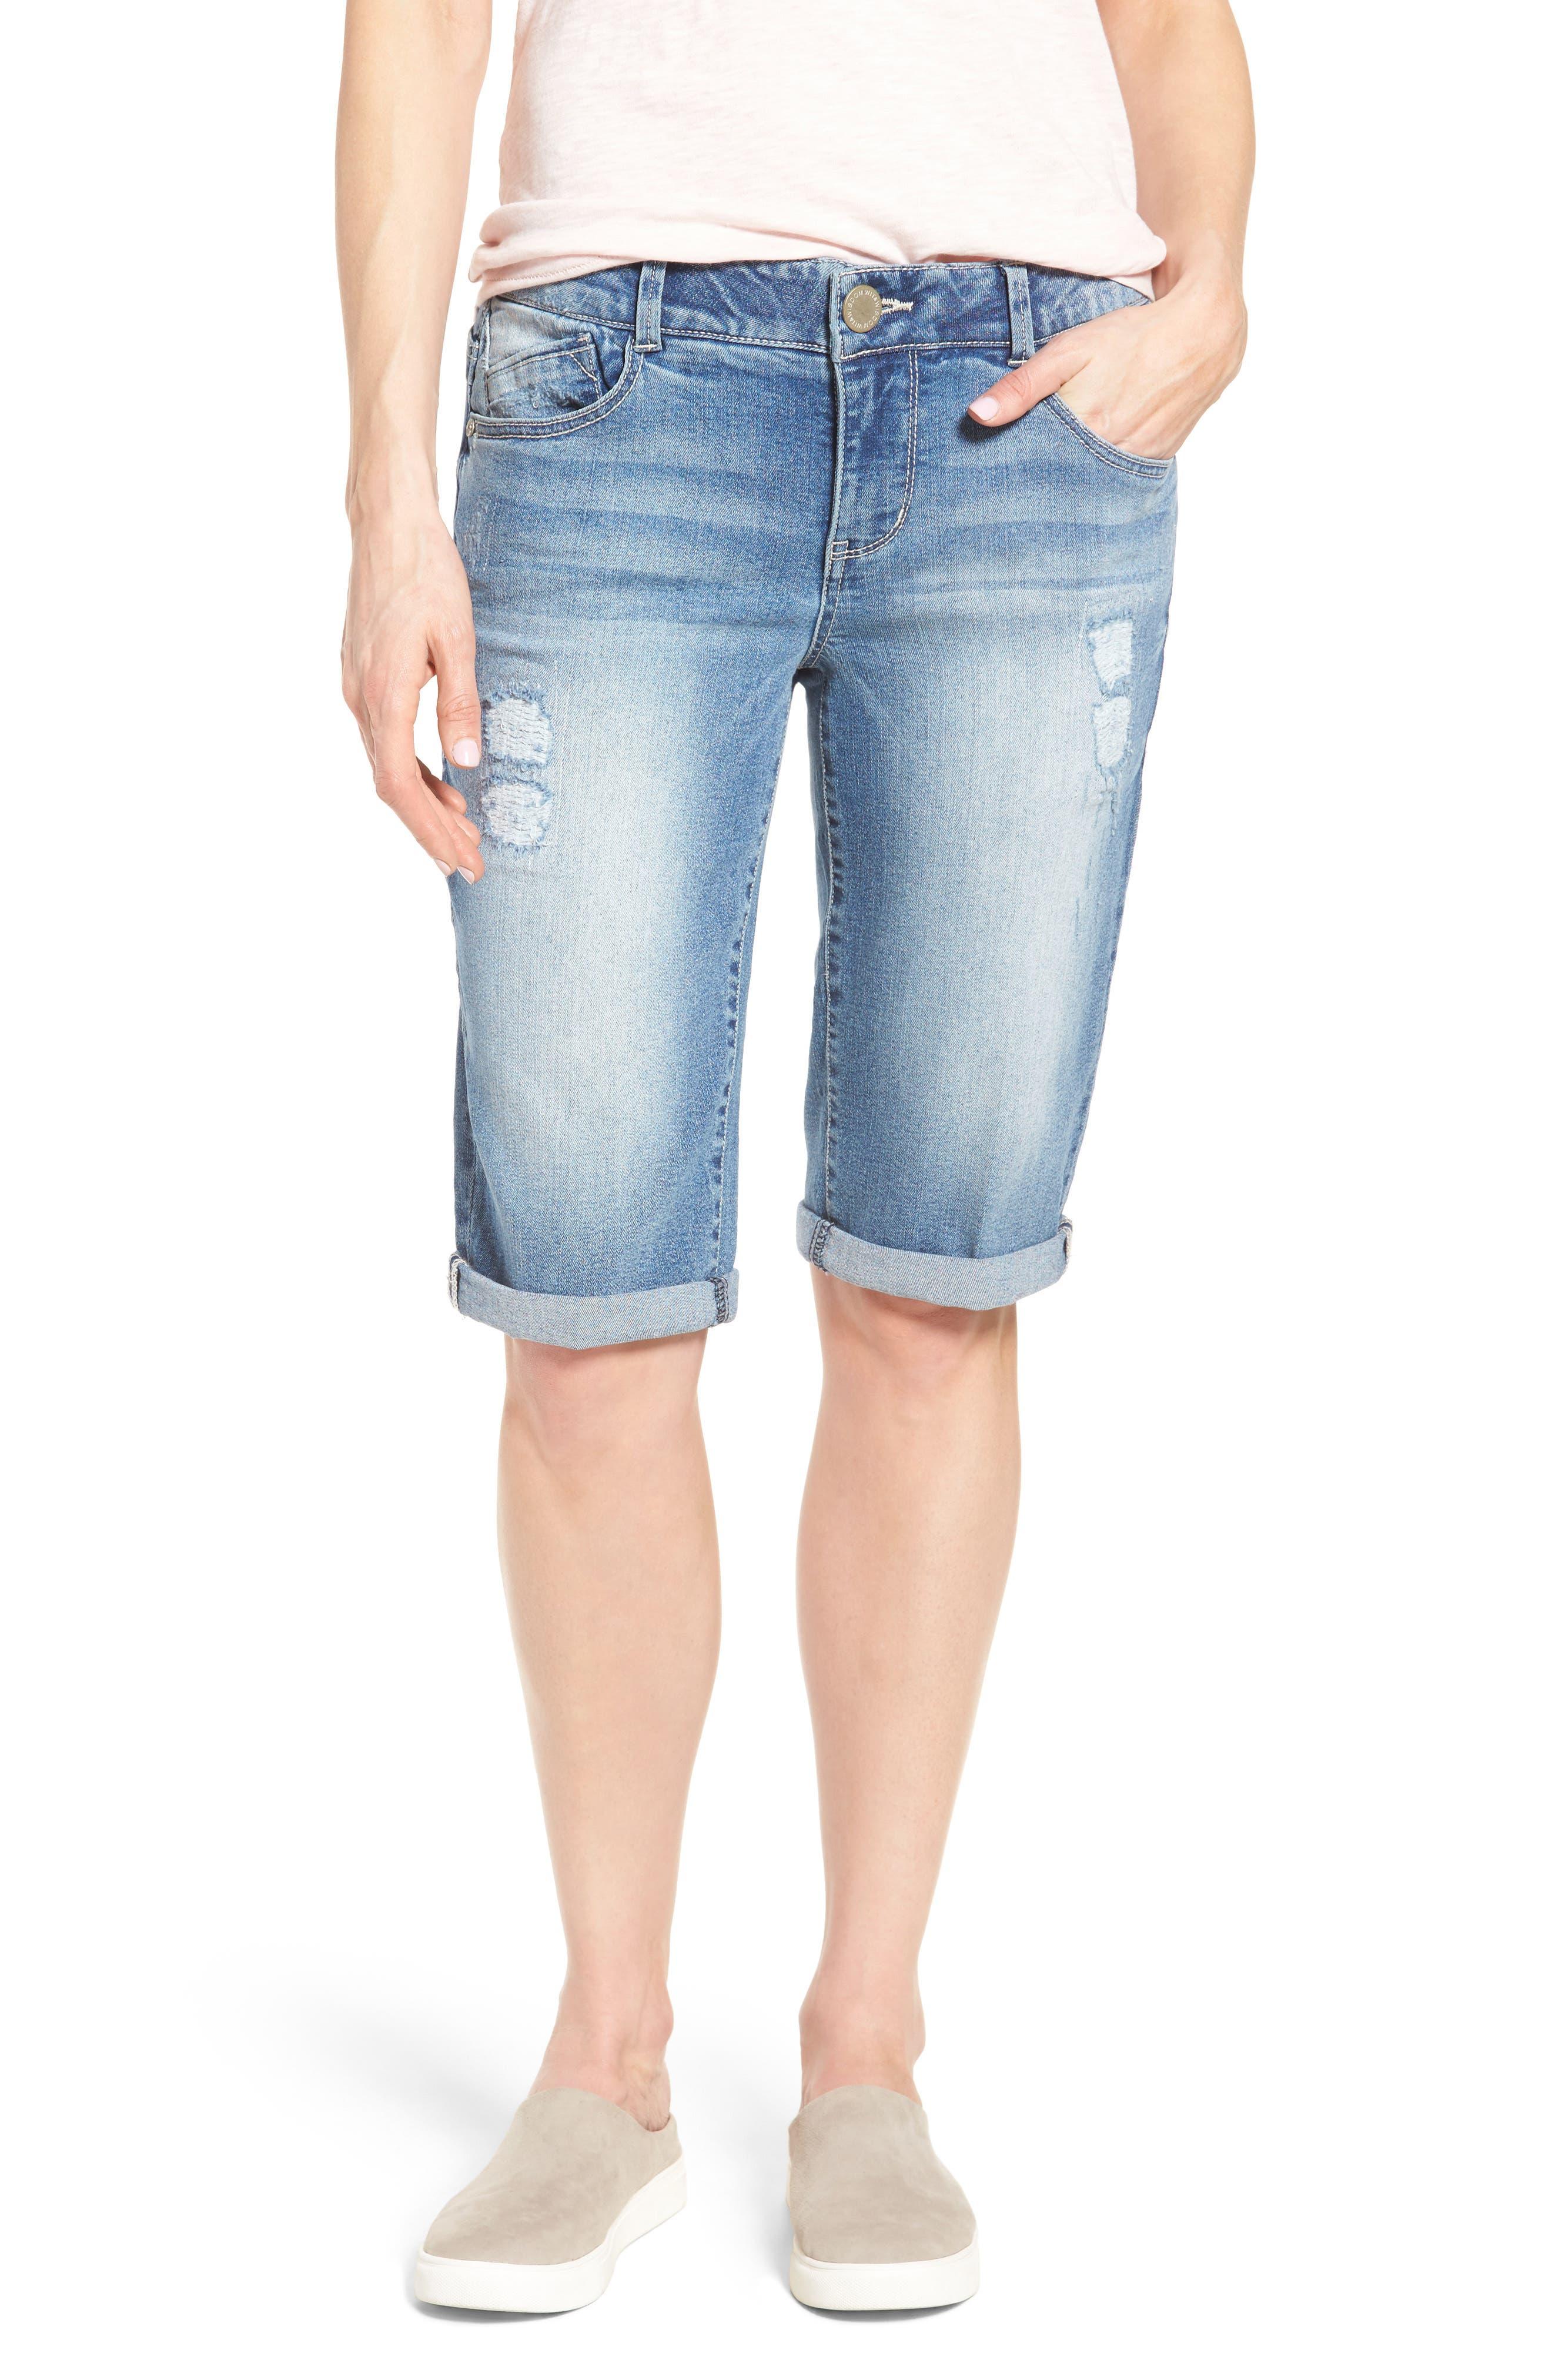 Wit & Wisdom Ab-solution Ripped Denim Bermuda Shorts (Regular & Petite) (Nordstrom Exclusive)